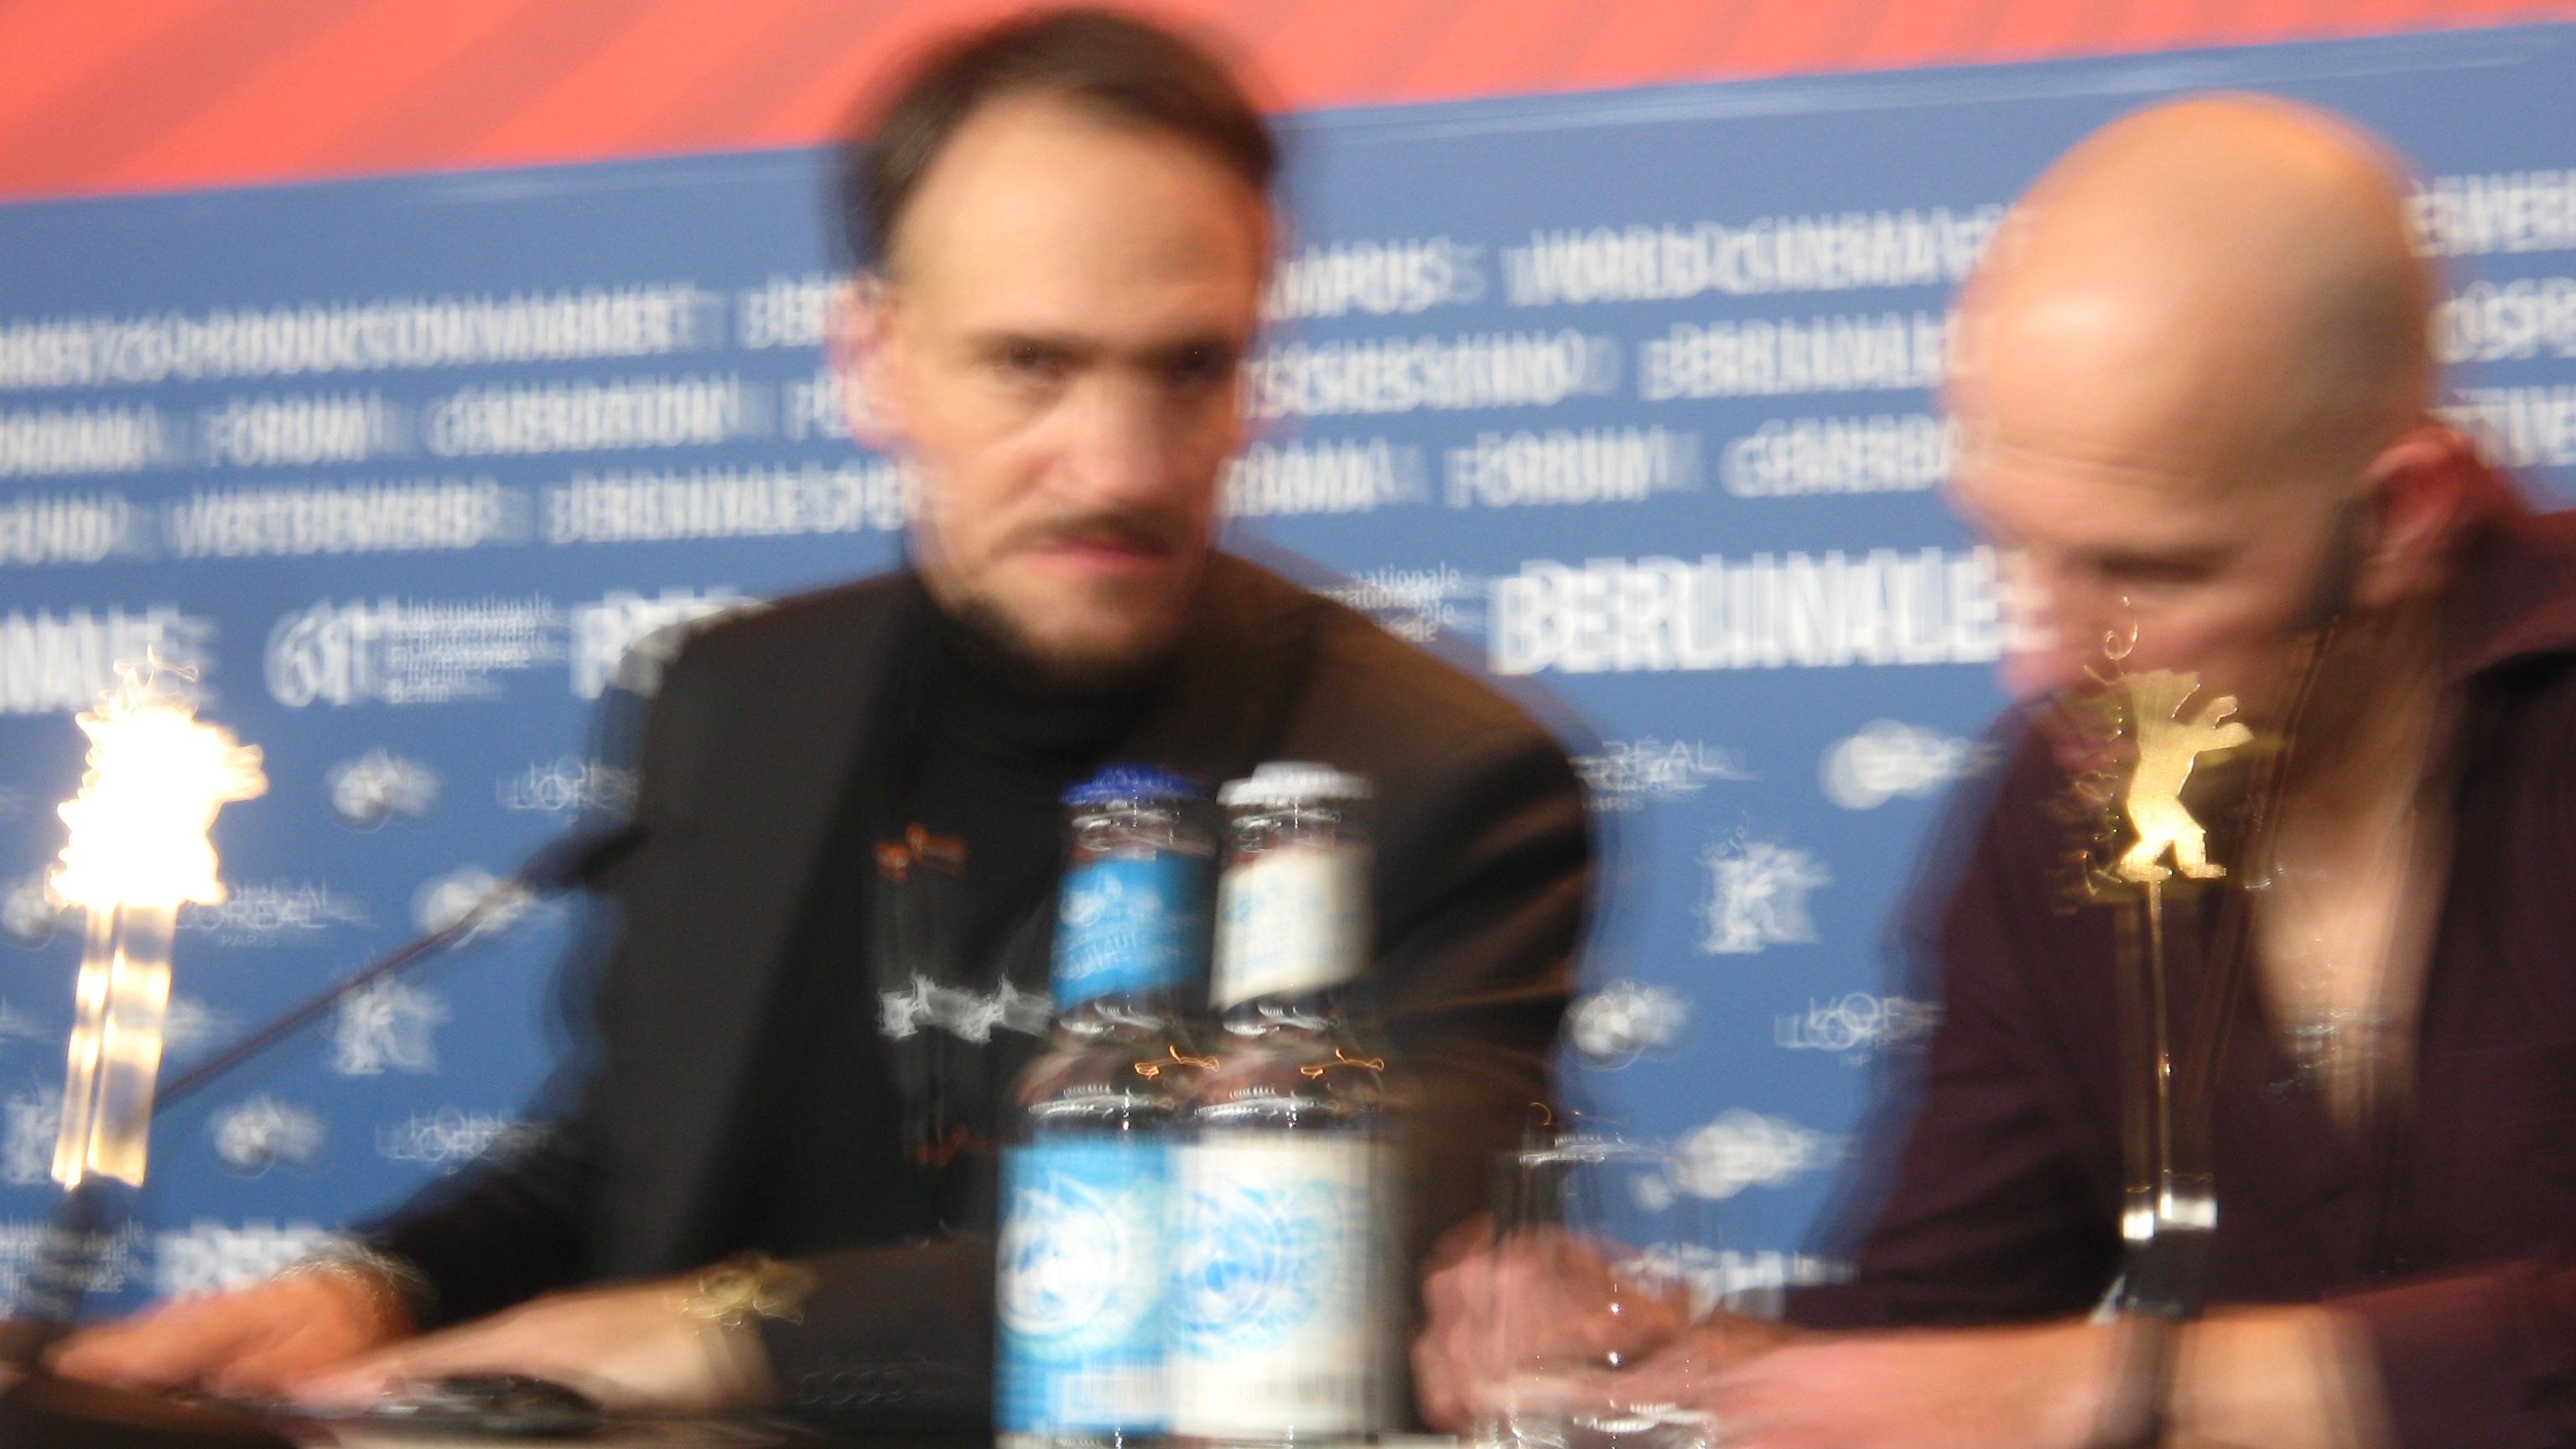 Mein Okto-Berlinale-Blog: Cyrill Tuschi, Я люблю тебя (jedenfalls den Film)